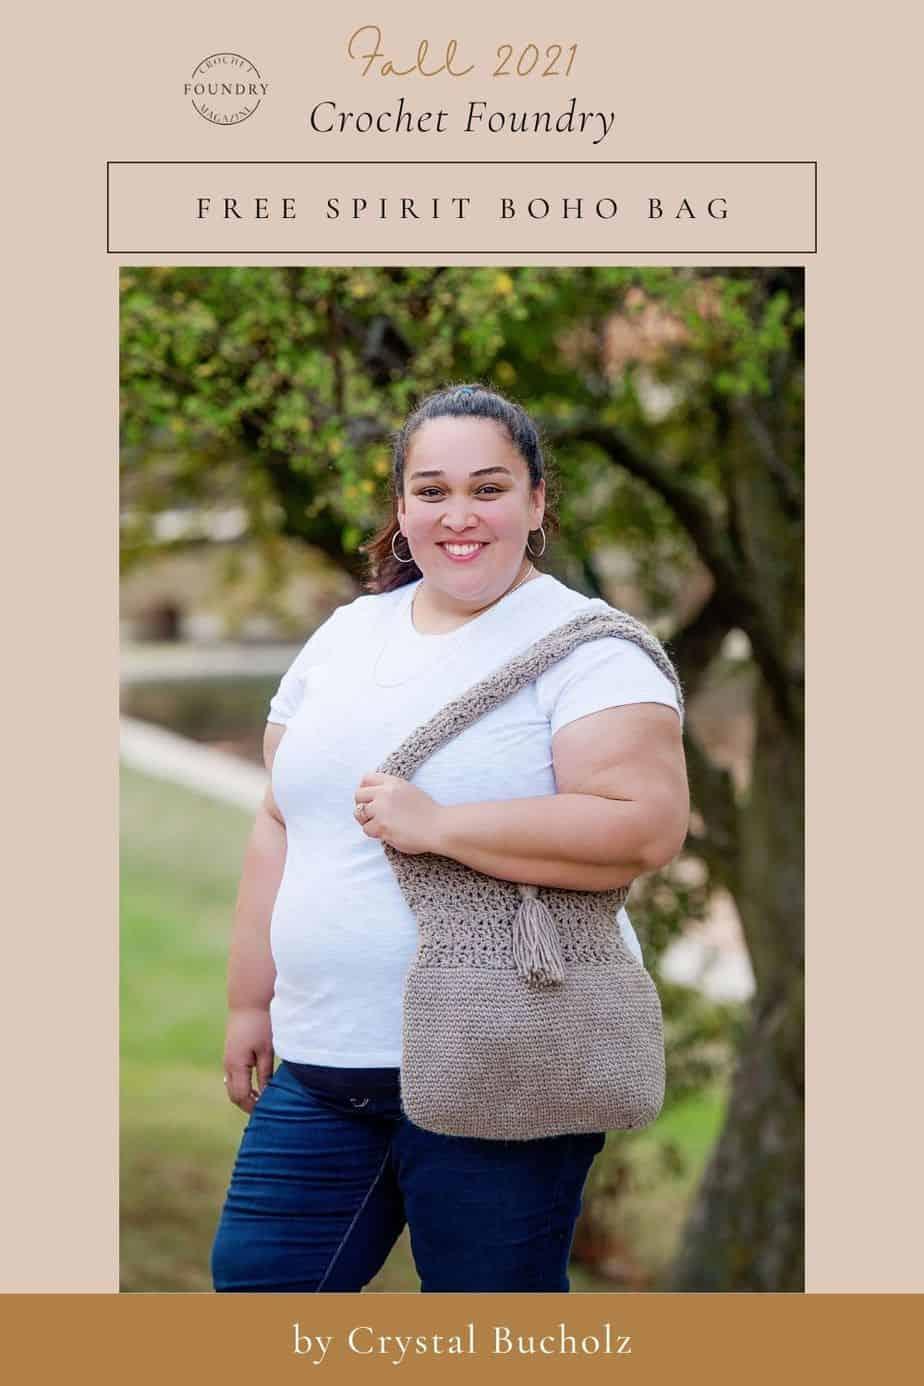 Free Spirit Boho Bag by Crystal Bucholz for Crochet Foundry Magazine 2021